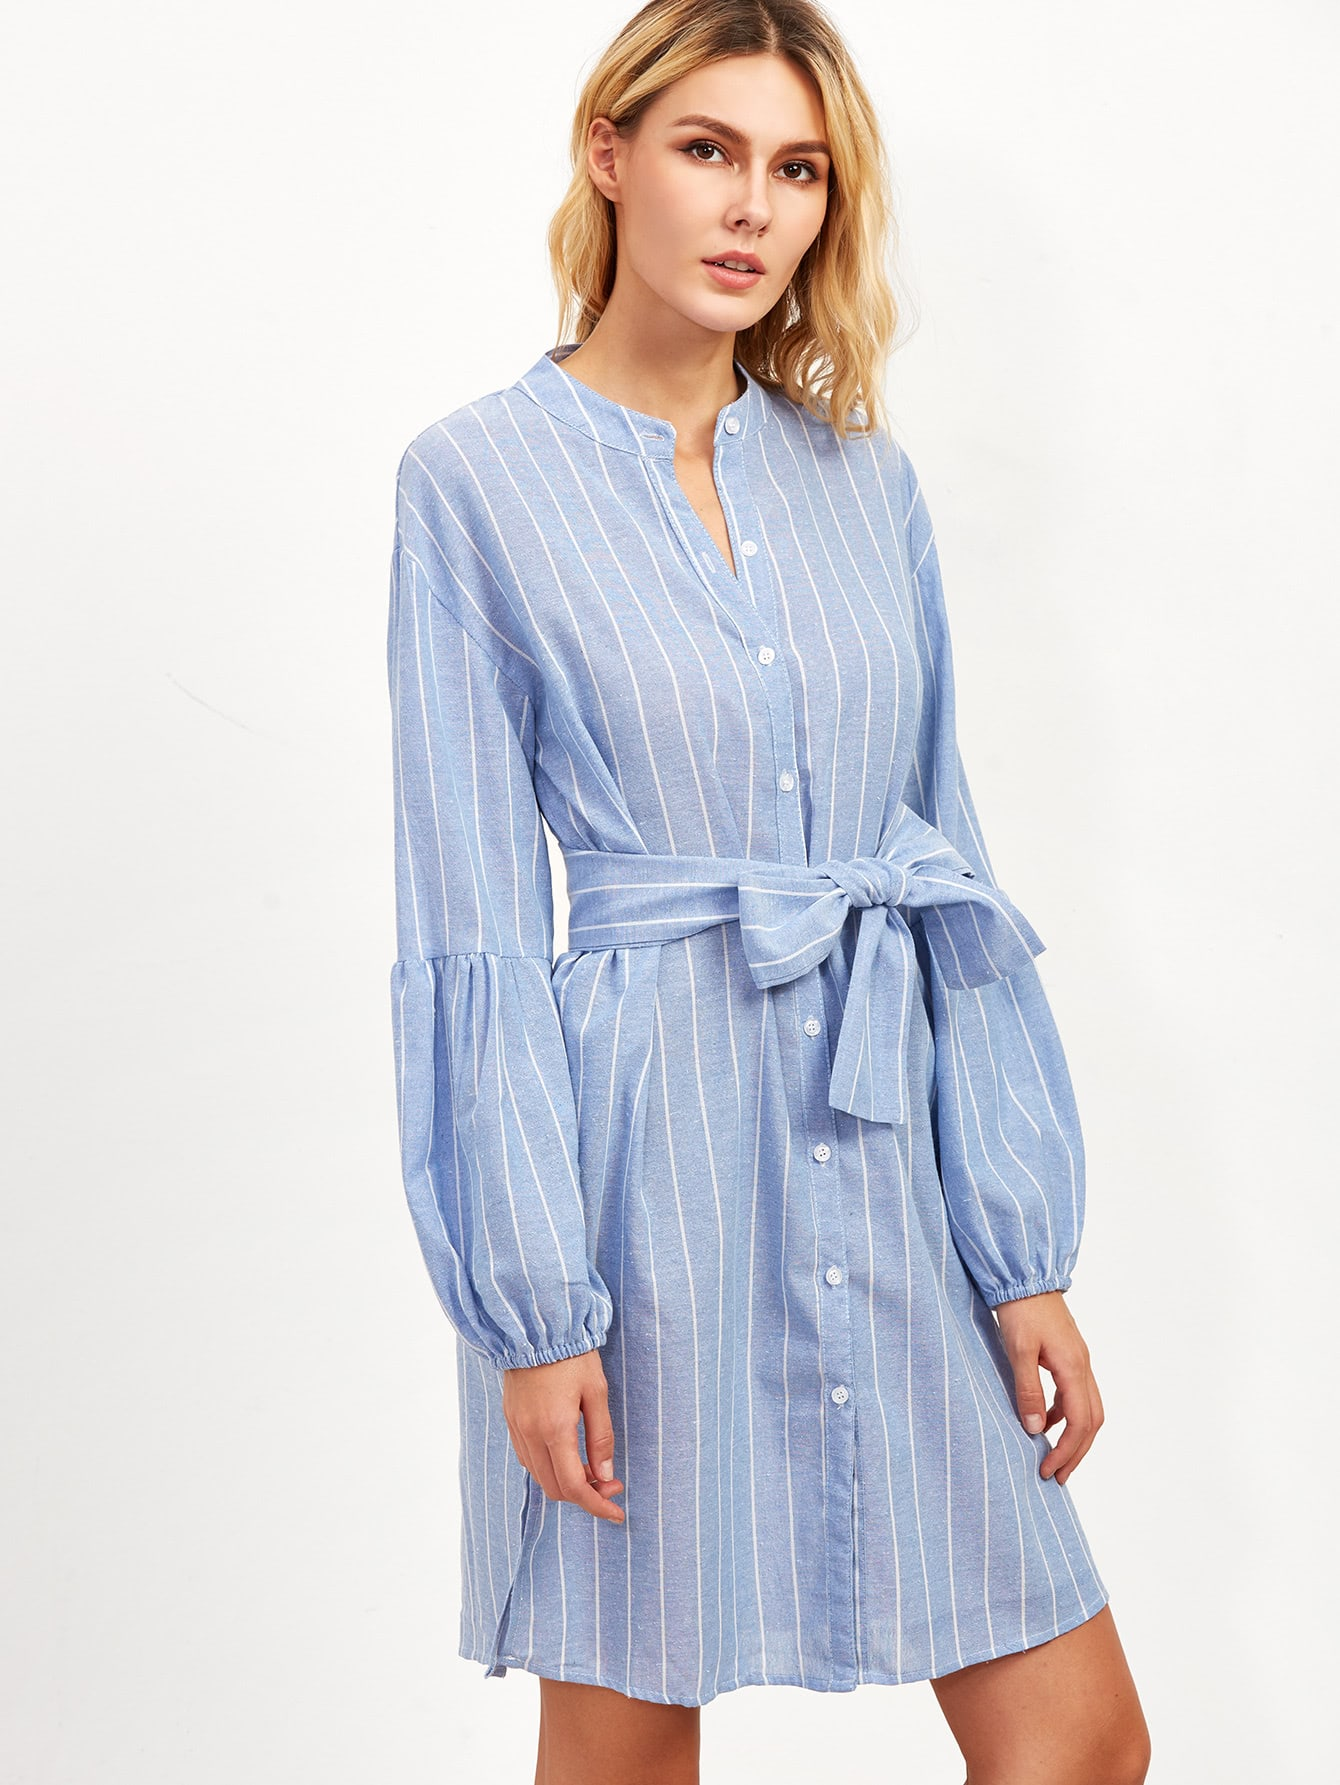 Blue vertical striped lantern sleeve belted shirt dress for Vertical striped dress shirt